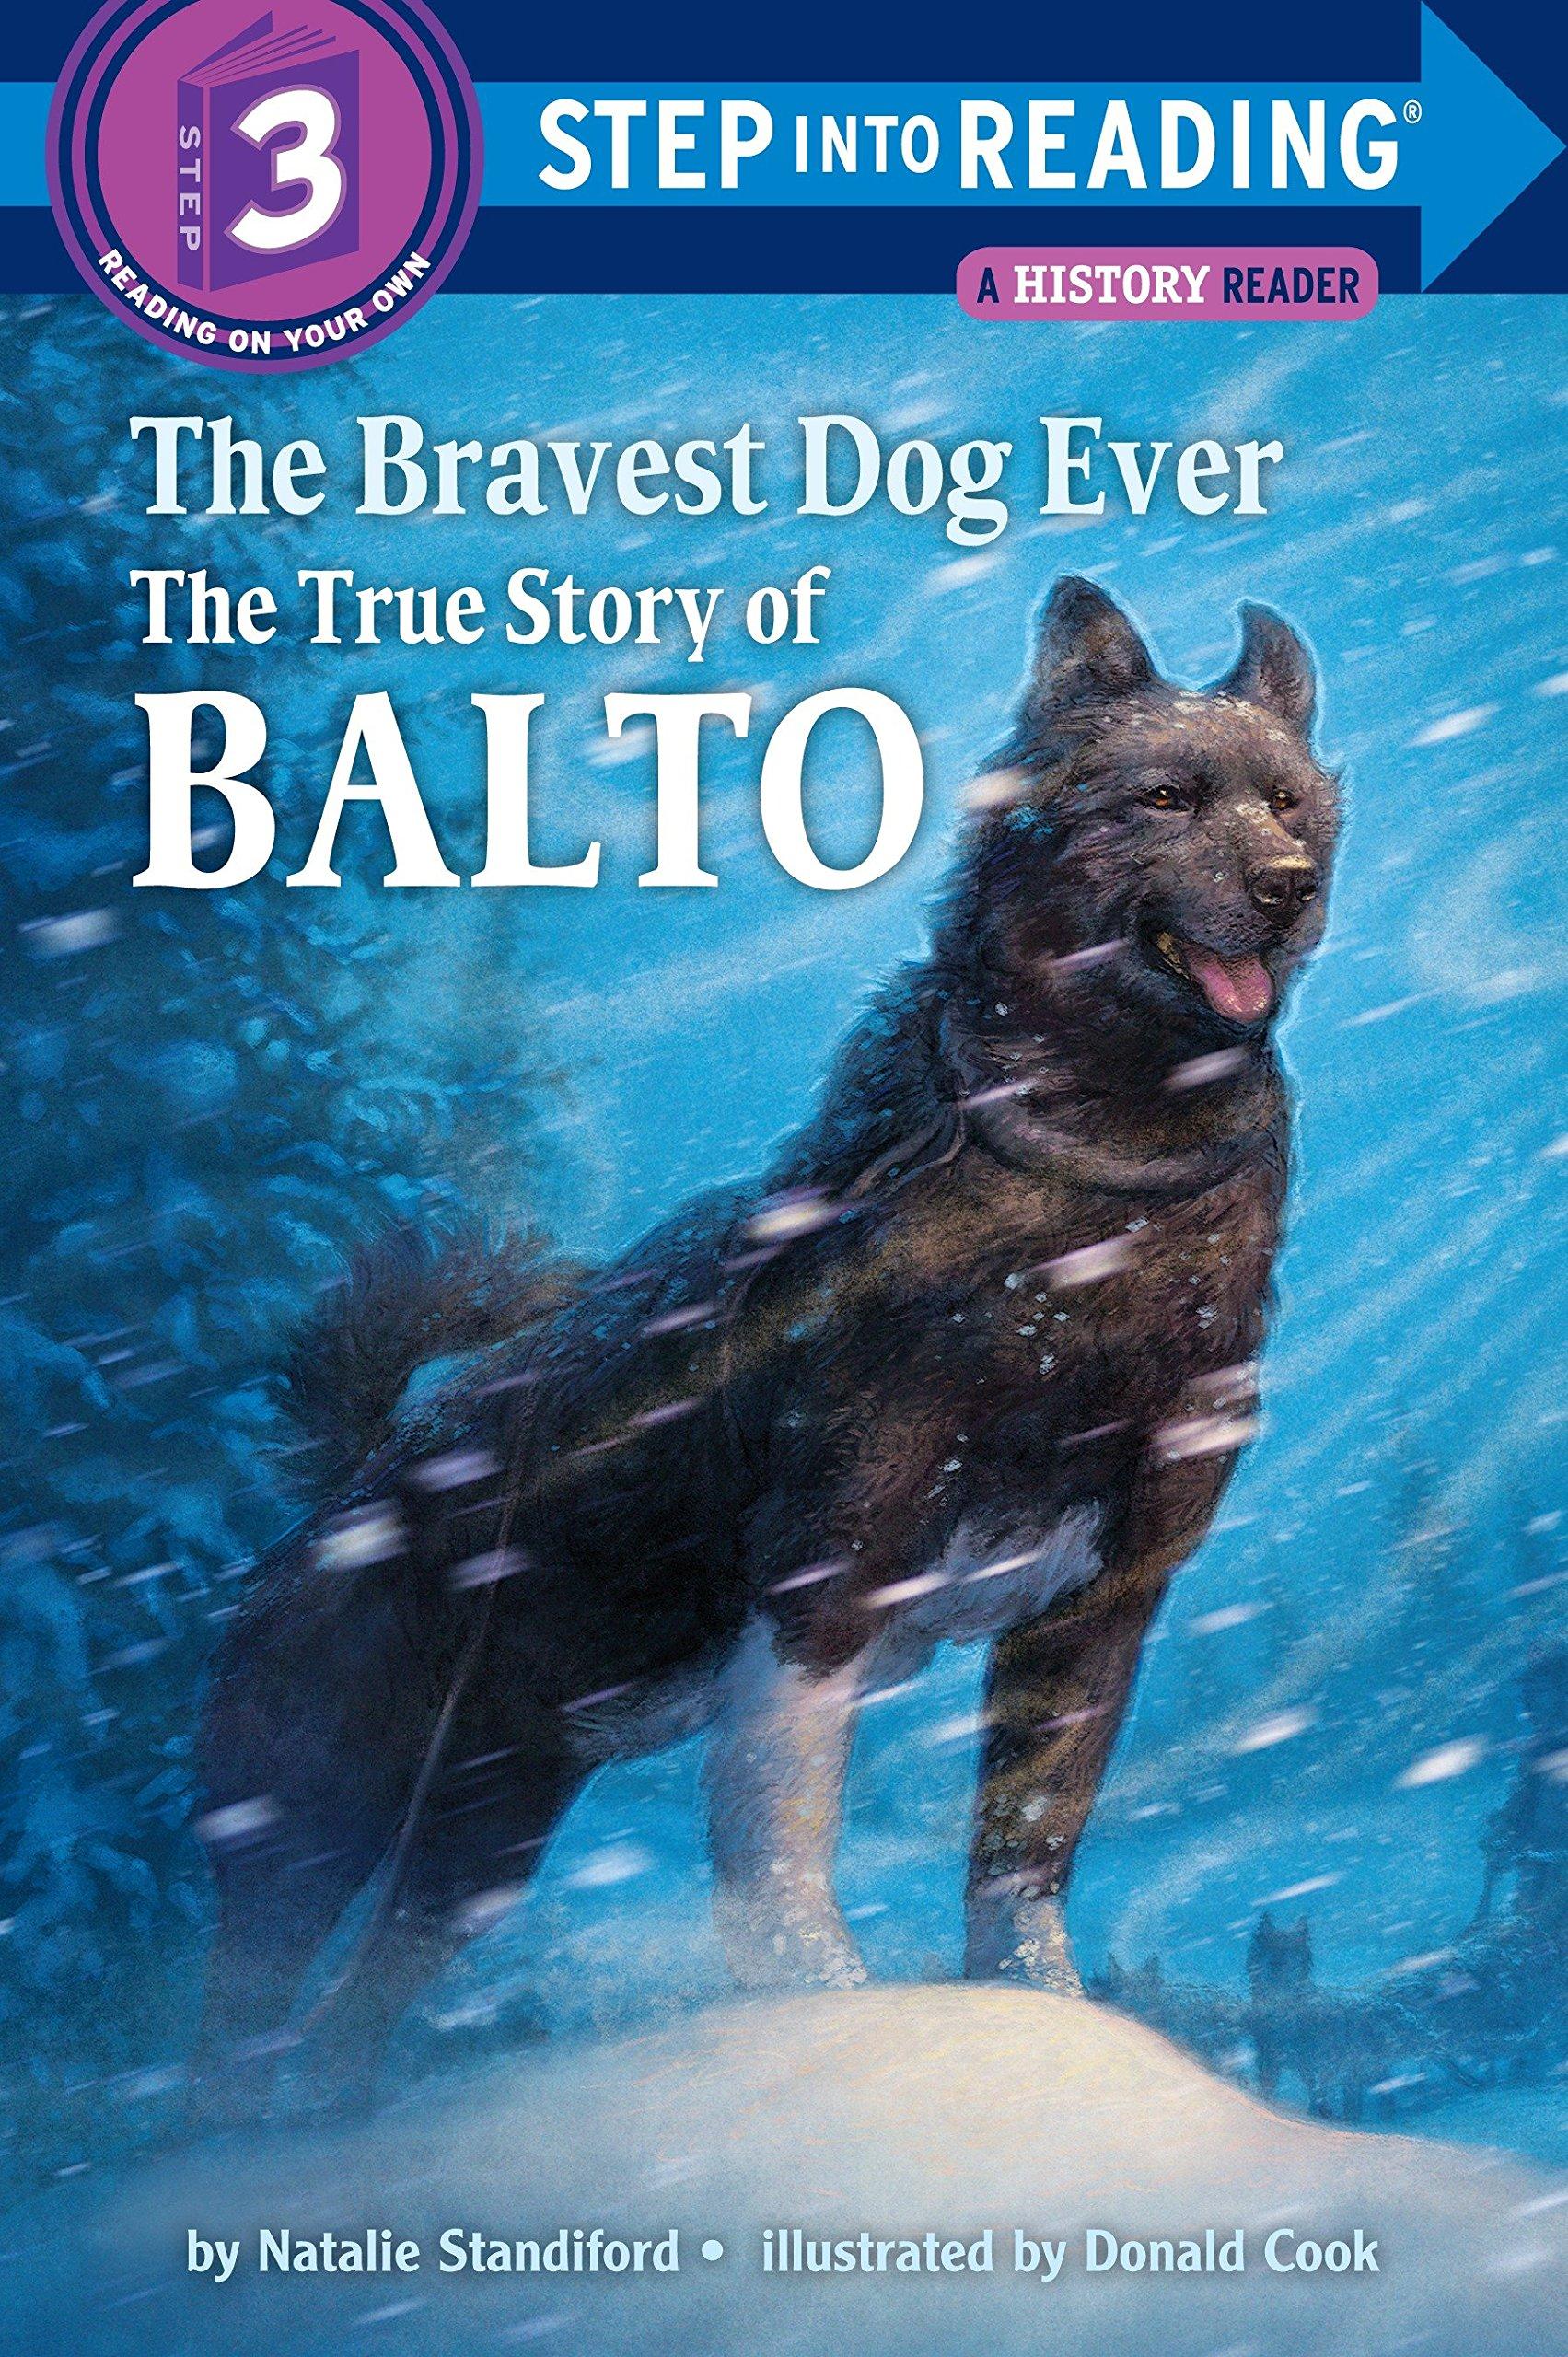 Book Cover of Balto, the Bravest Dog Ever